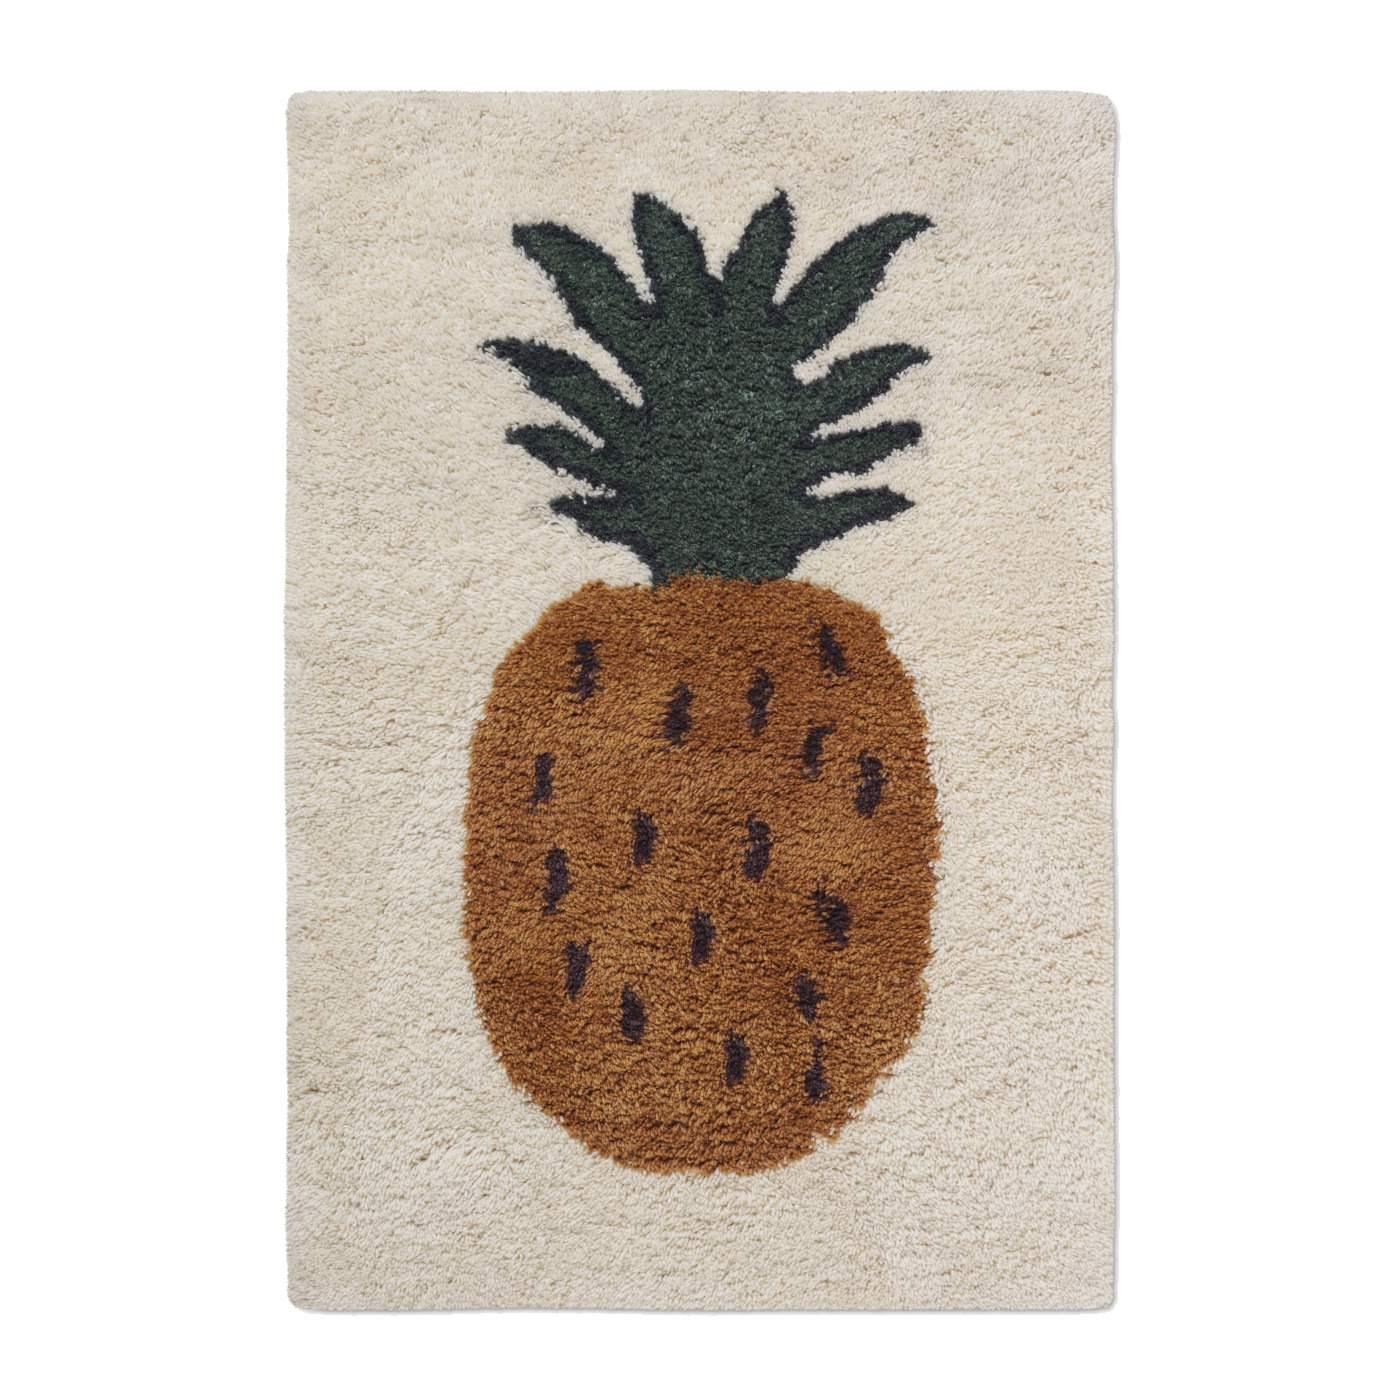 Barnmatta FRUITICANA ananas large, Ferm Living